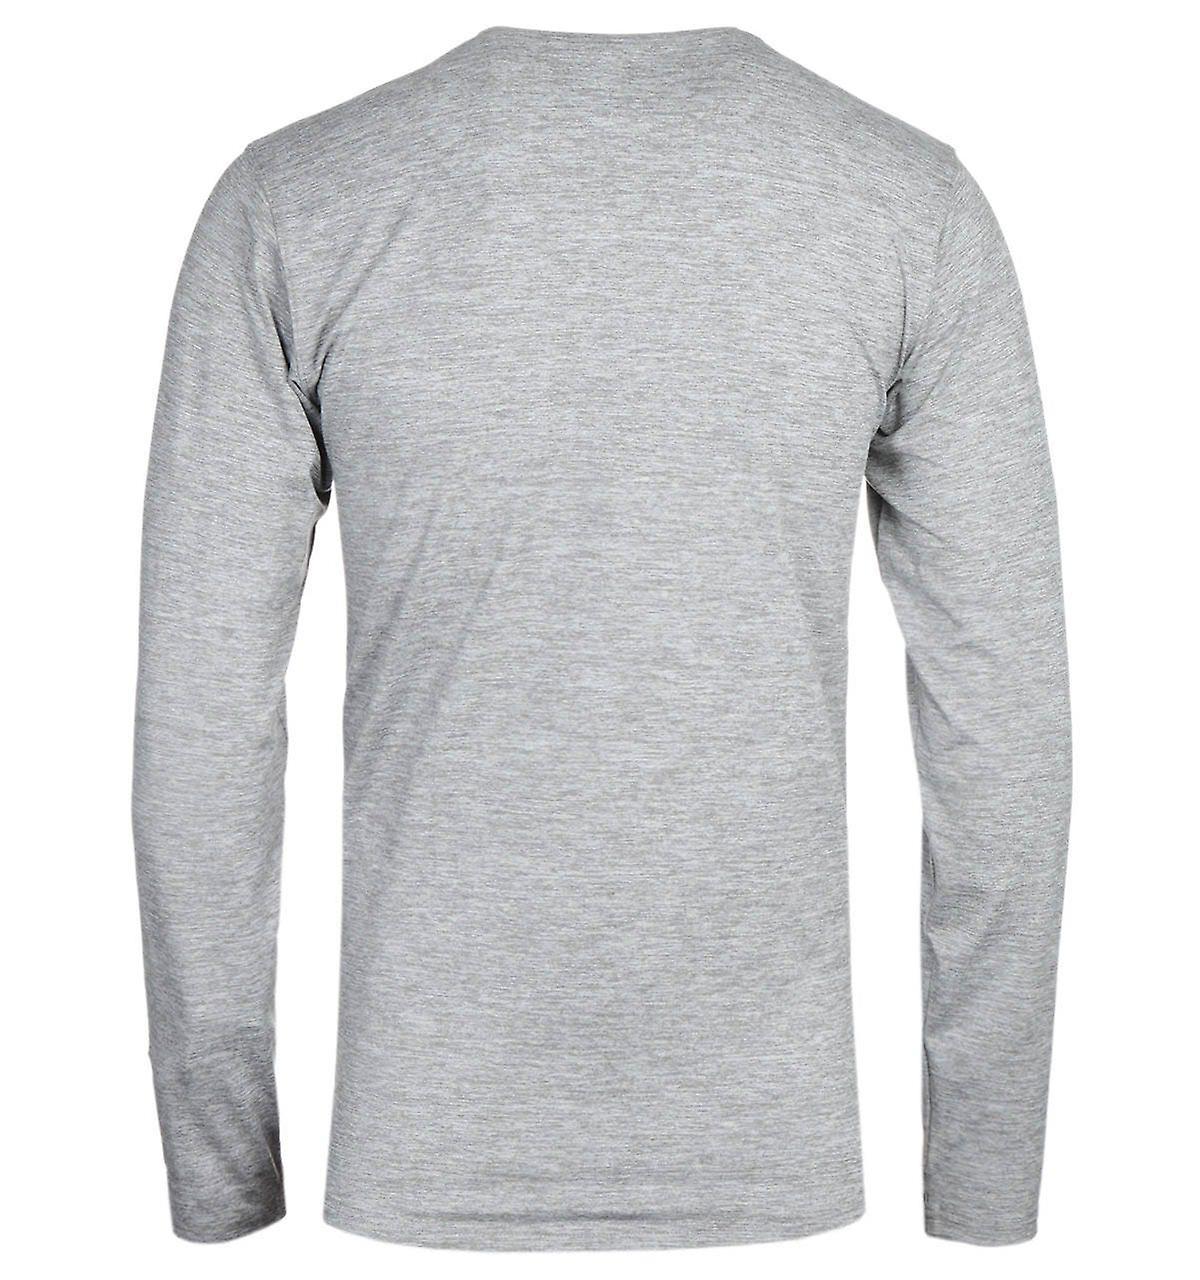 Columbia Tech Trail Grey Heather Long Sleeve T-Shirt